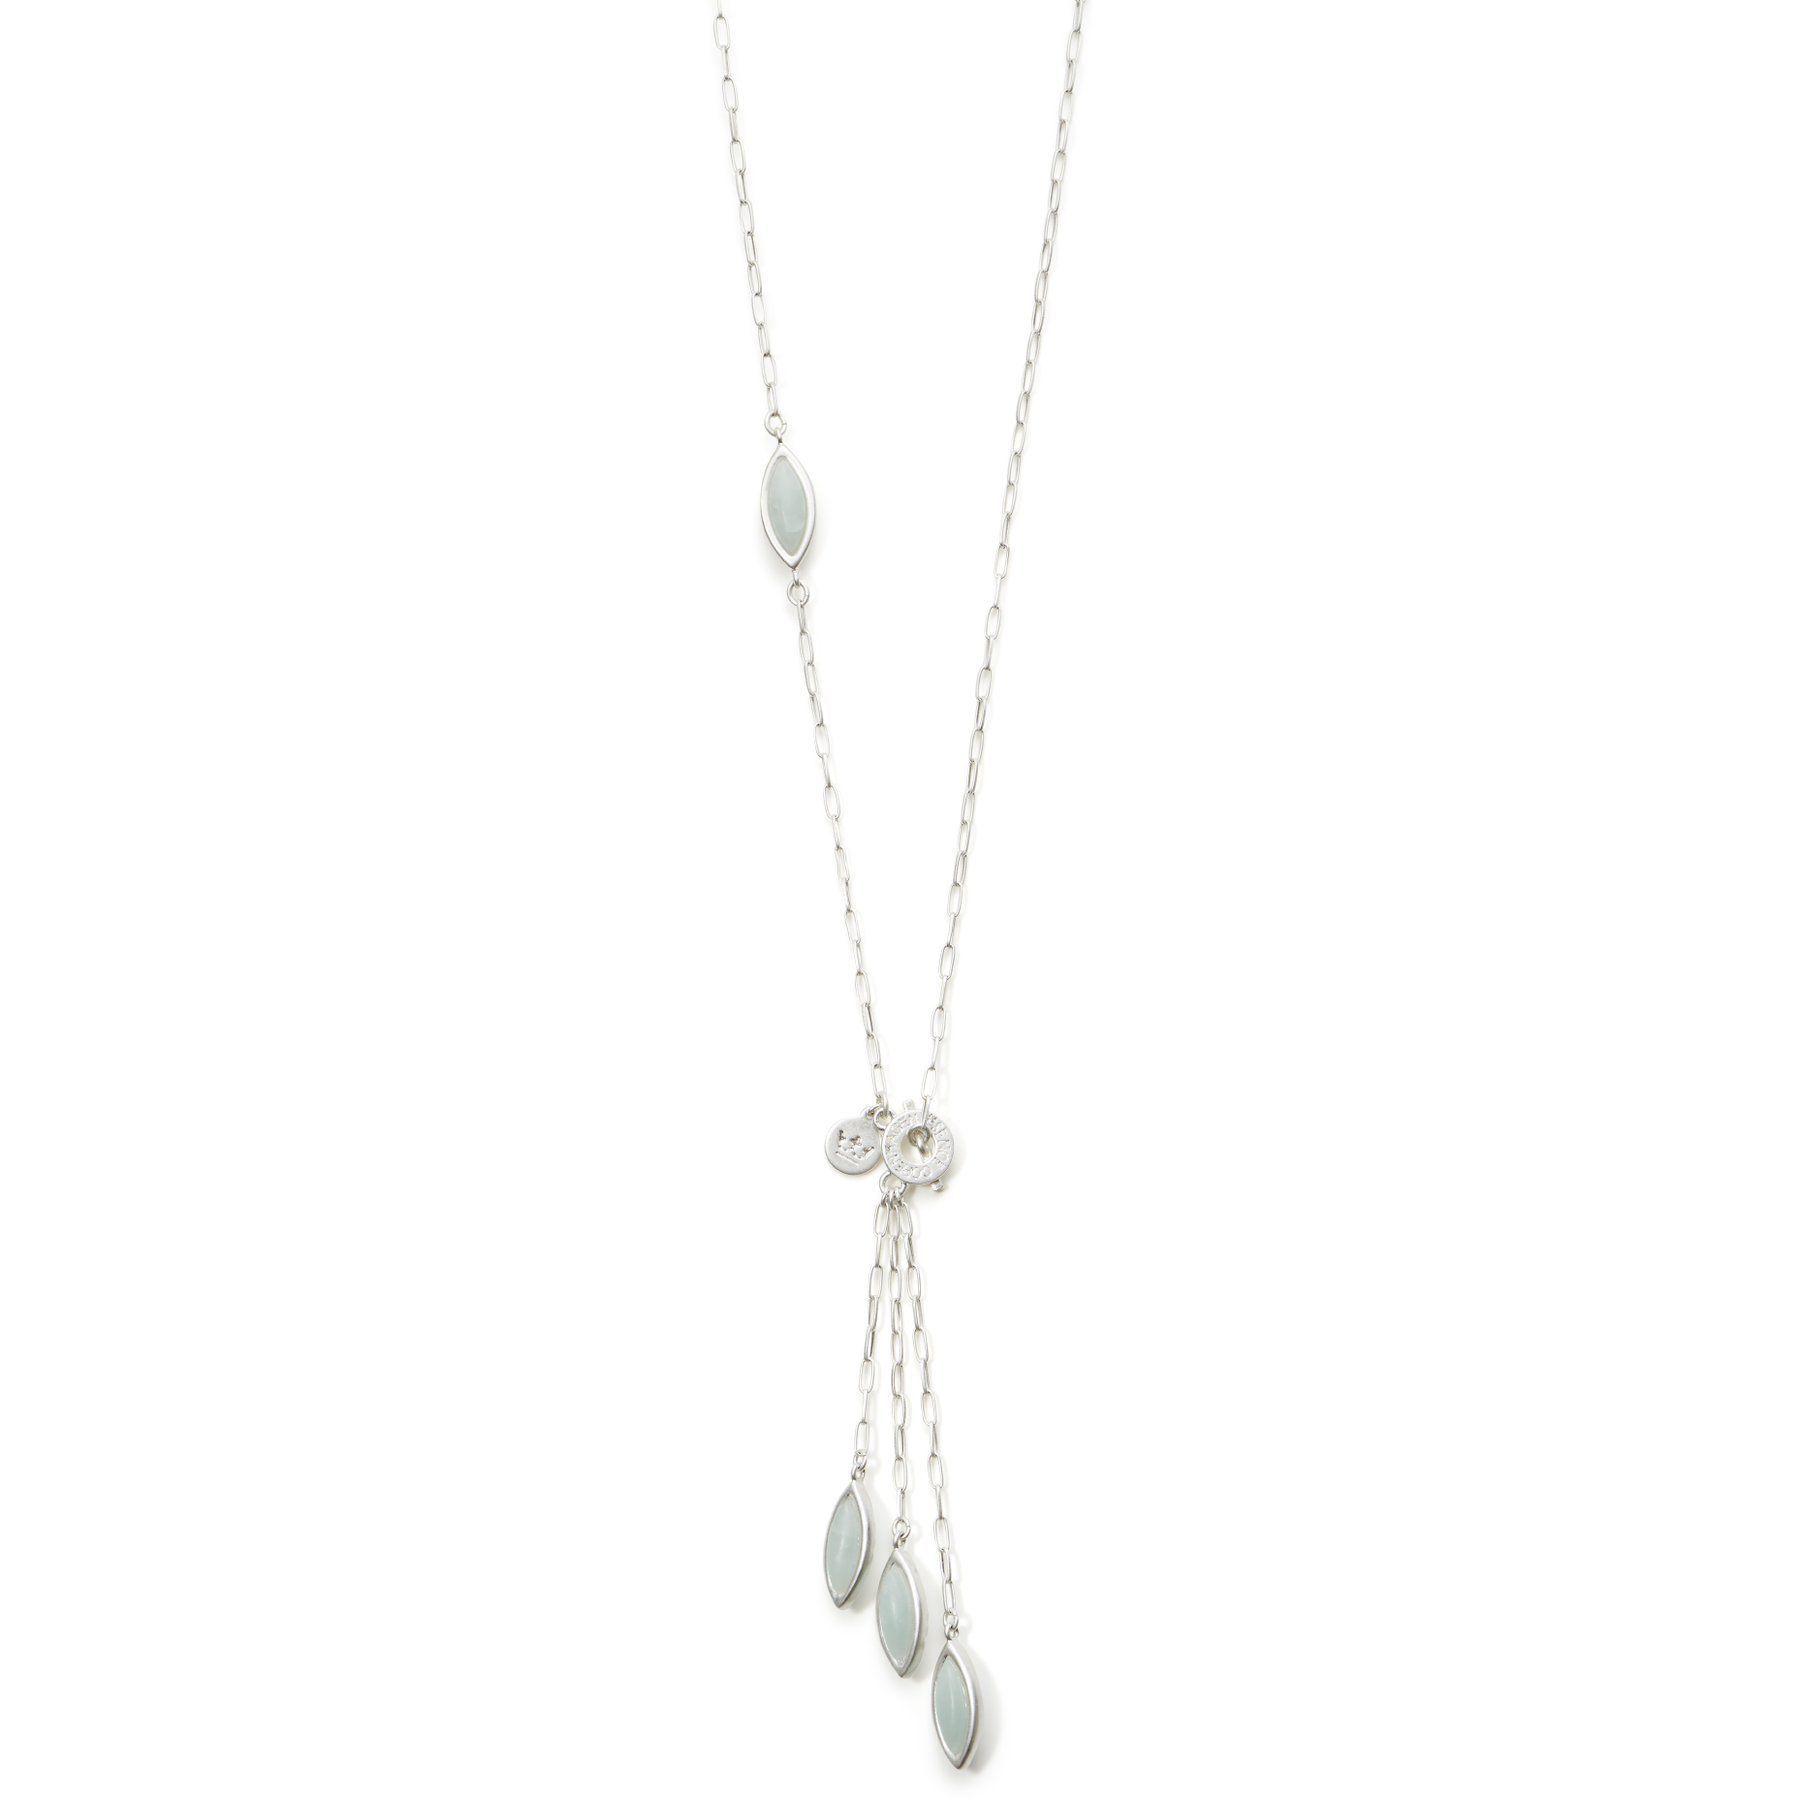 Sence Birch Necklace Aquamarine and Matt Silver